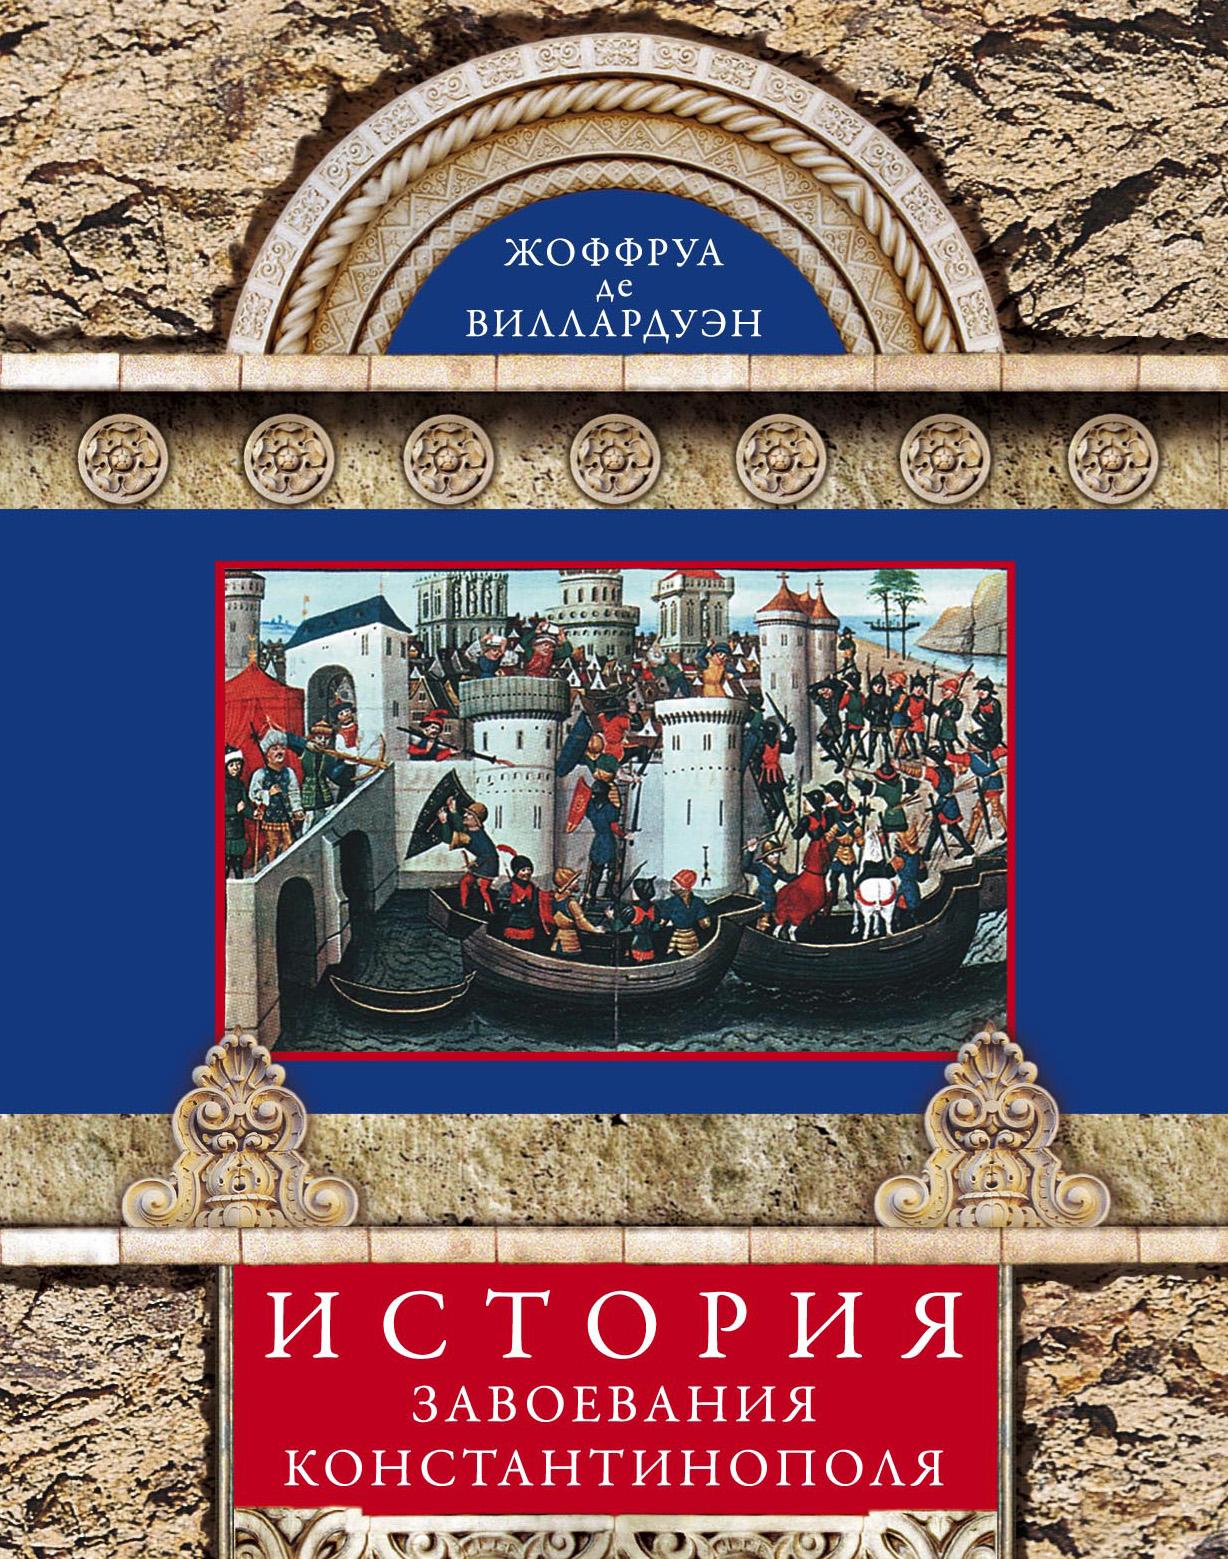 купить Жоффруа де Виллардуэн История завоевания Константинополя по цене 129.9 рублей